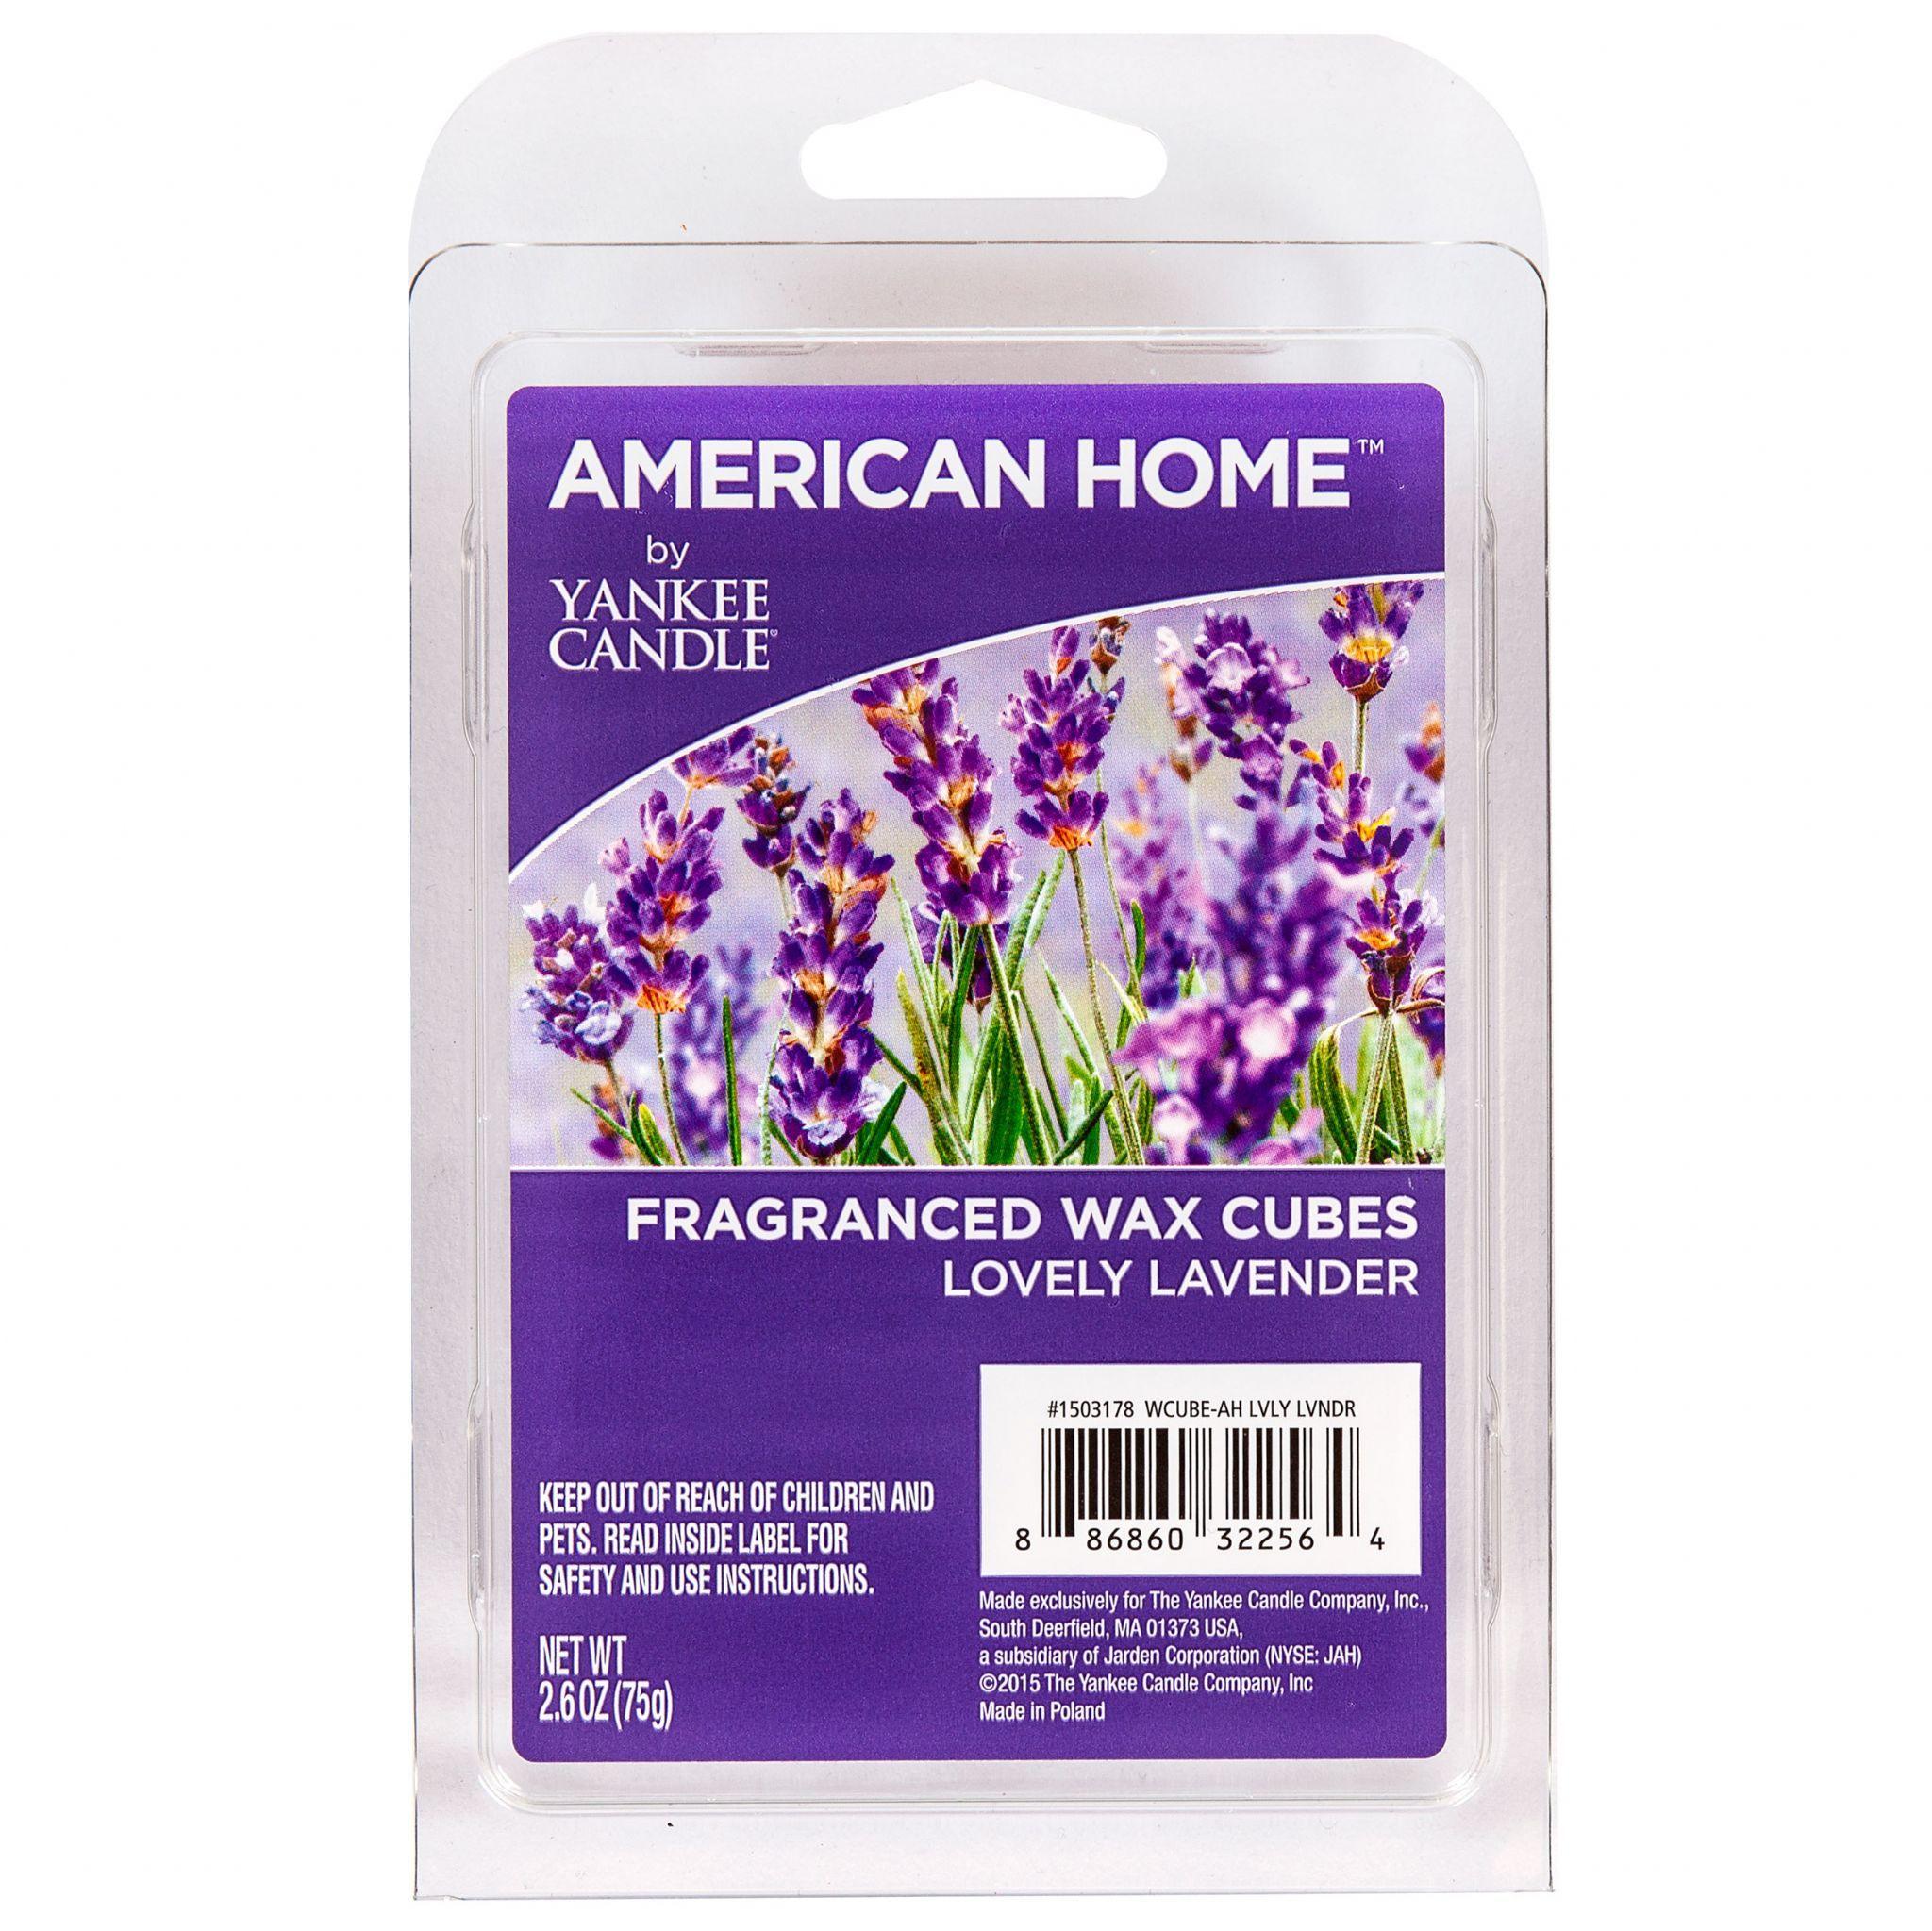 Vonný vosk Yankee Candle Lovely Lavender 75 g USA